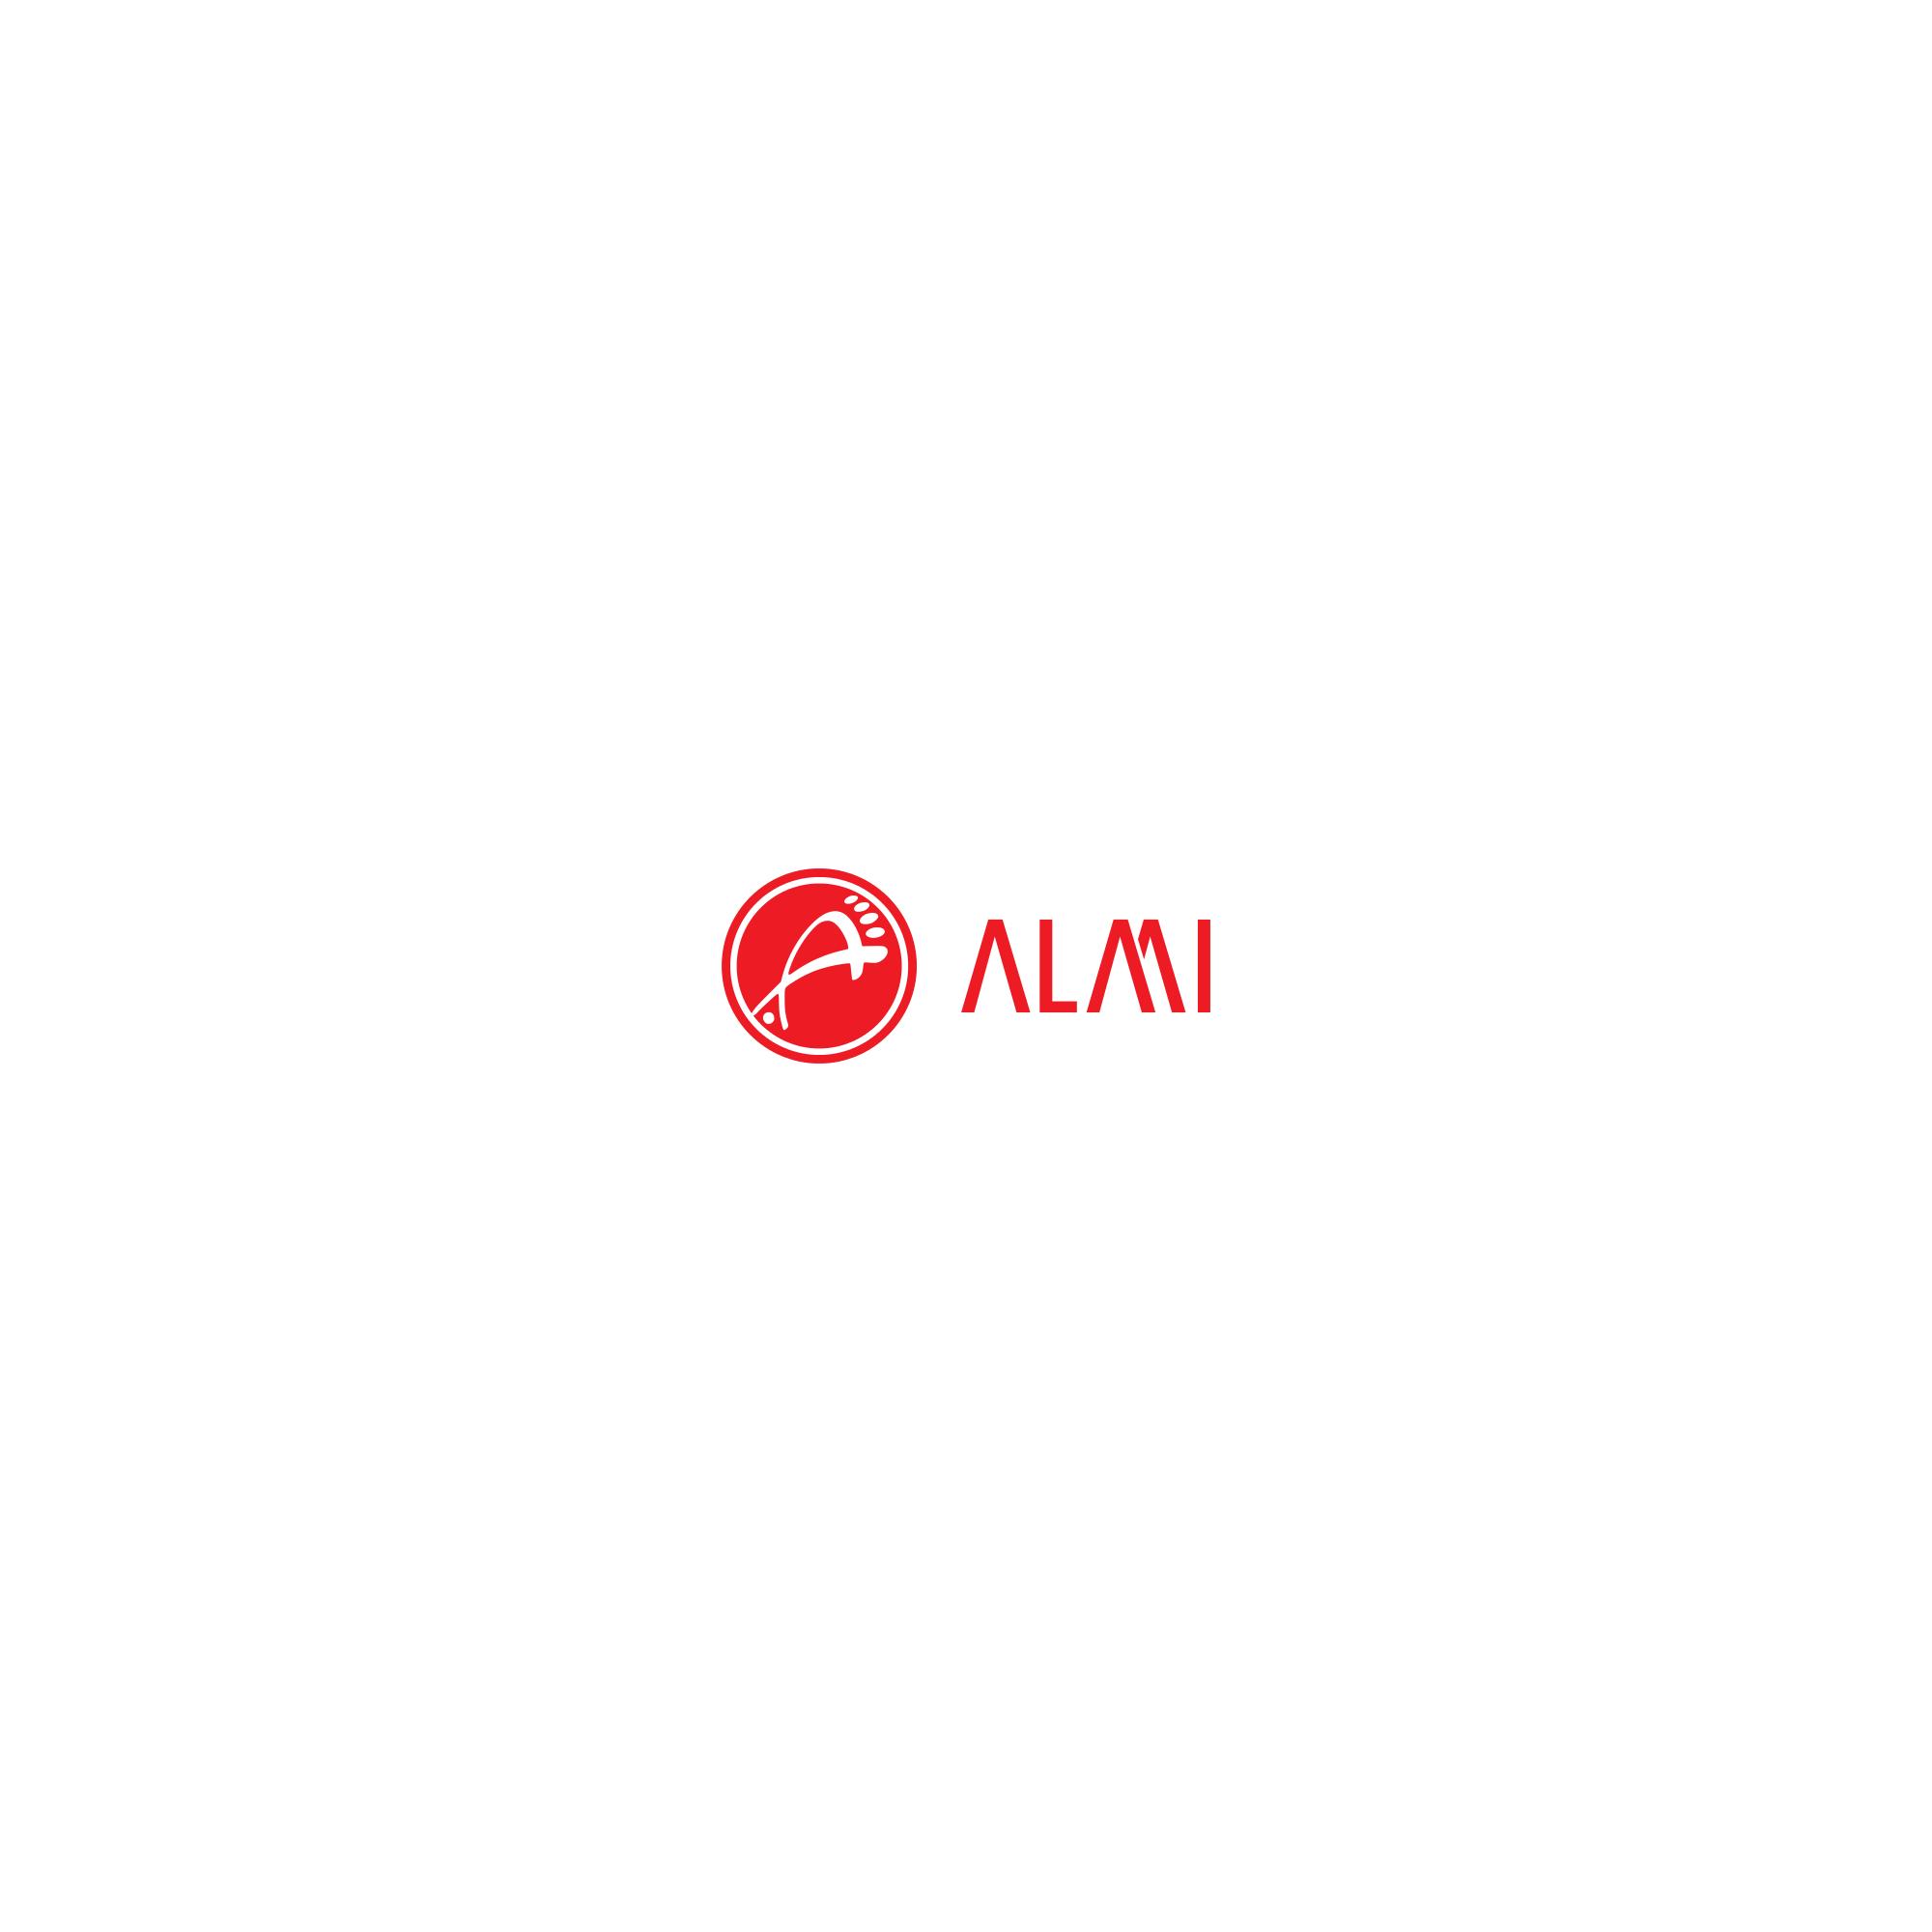 Дизайн логотипа обувной марки Алми фото f_30659f12d0fbe7ac.png